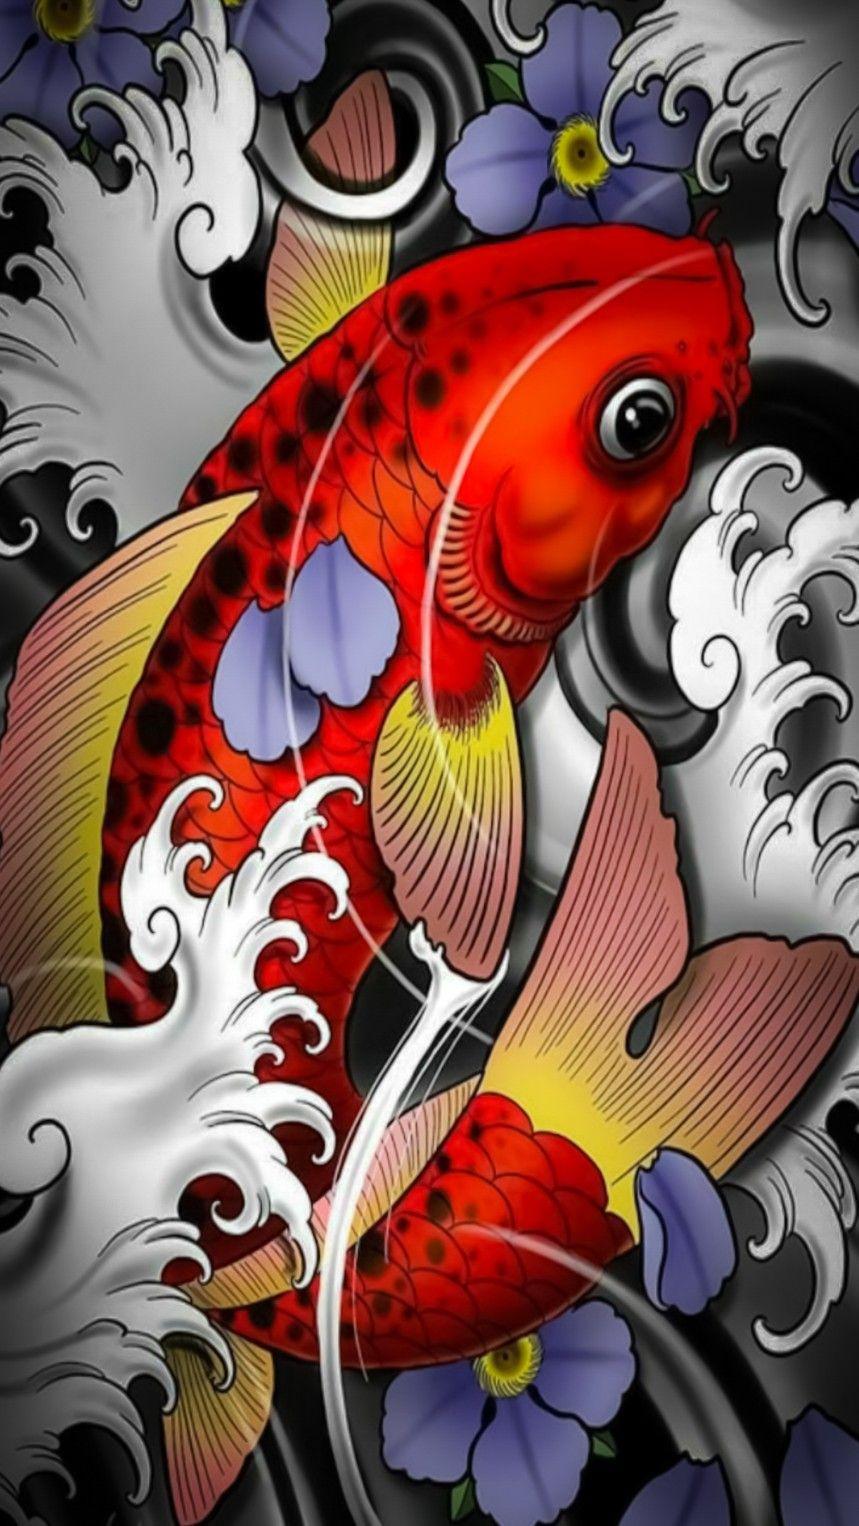 Pin By Marcio Oliveira On Airbrush In 2020 Japan Art Japanese Art Dragon Koi Tattoo Design